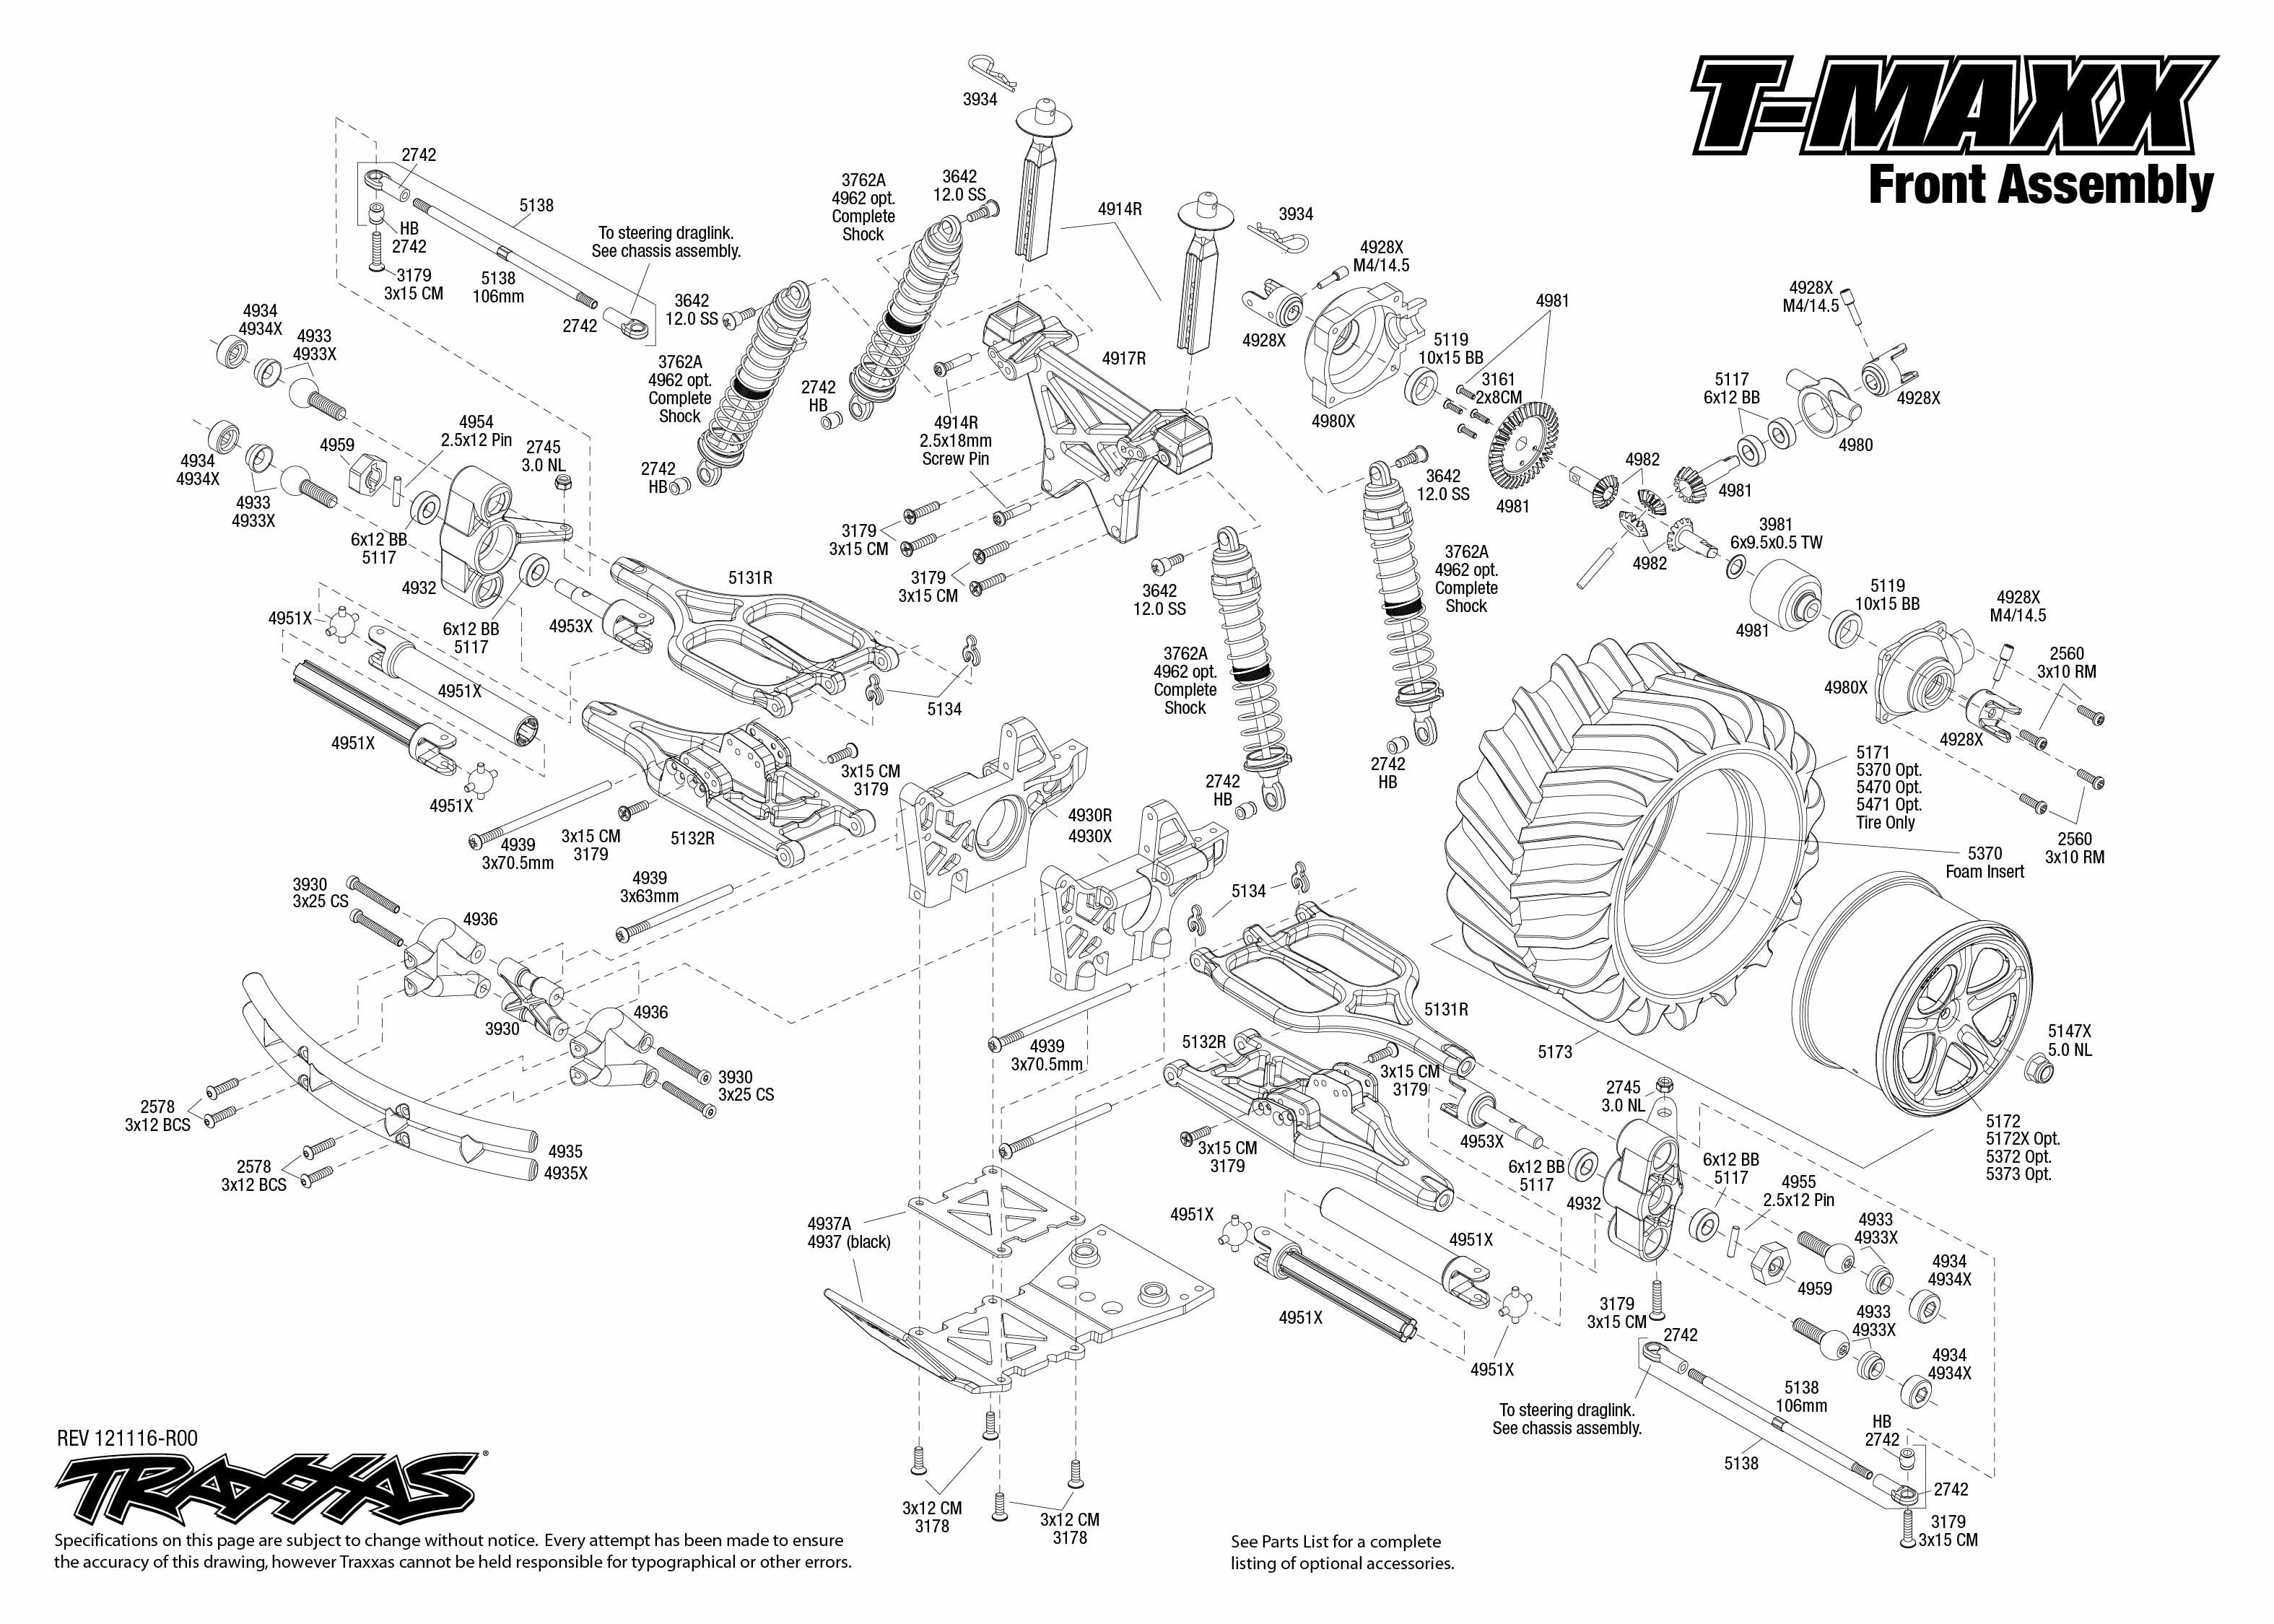 07 dodge nitro engine diagram front